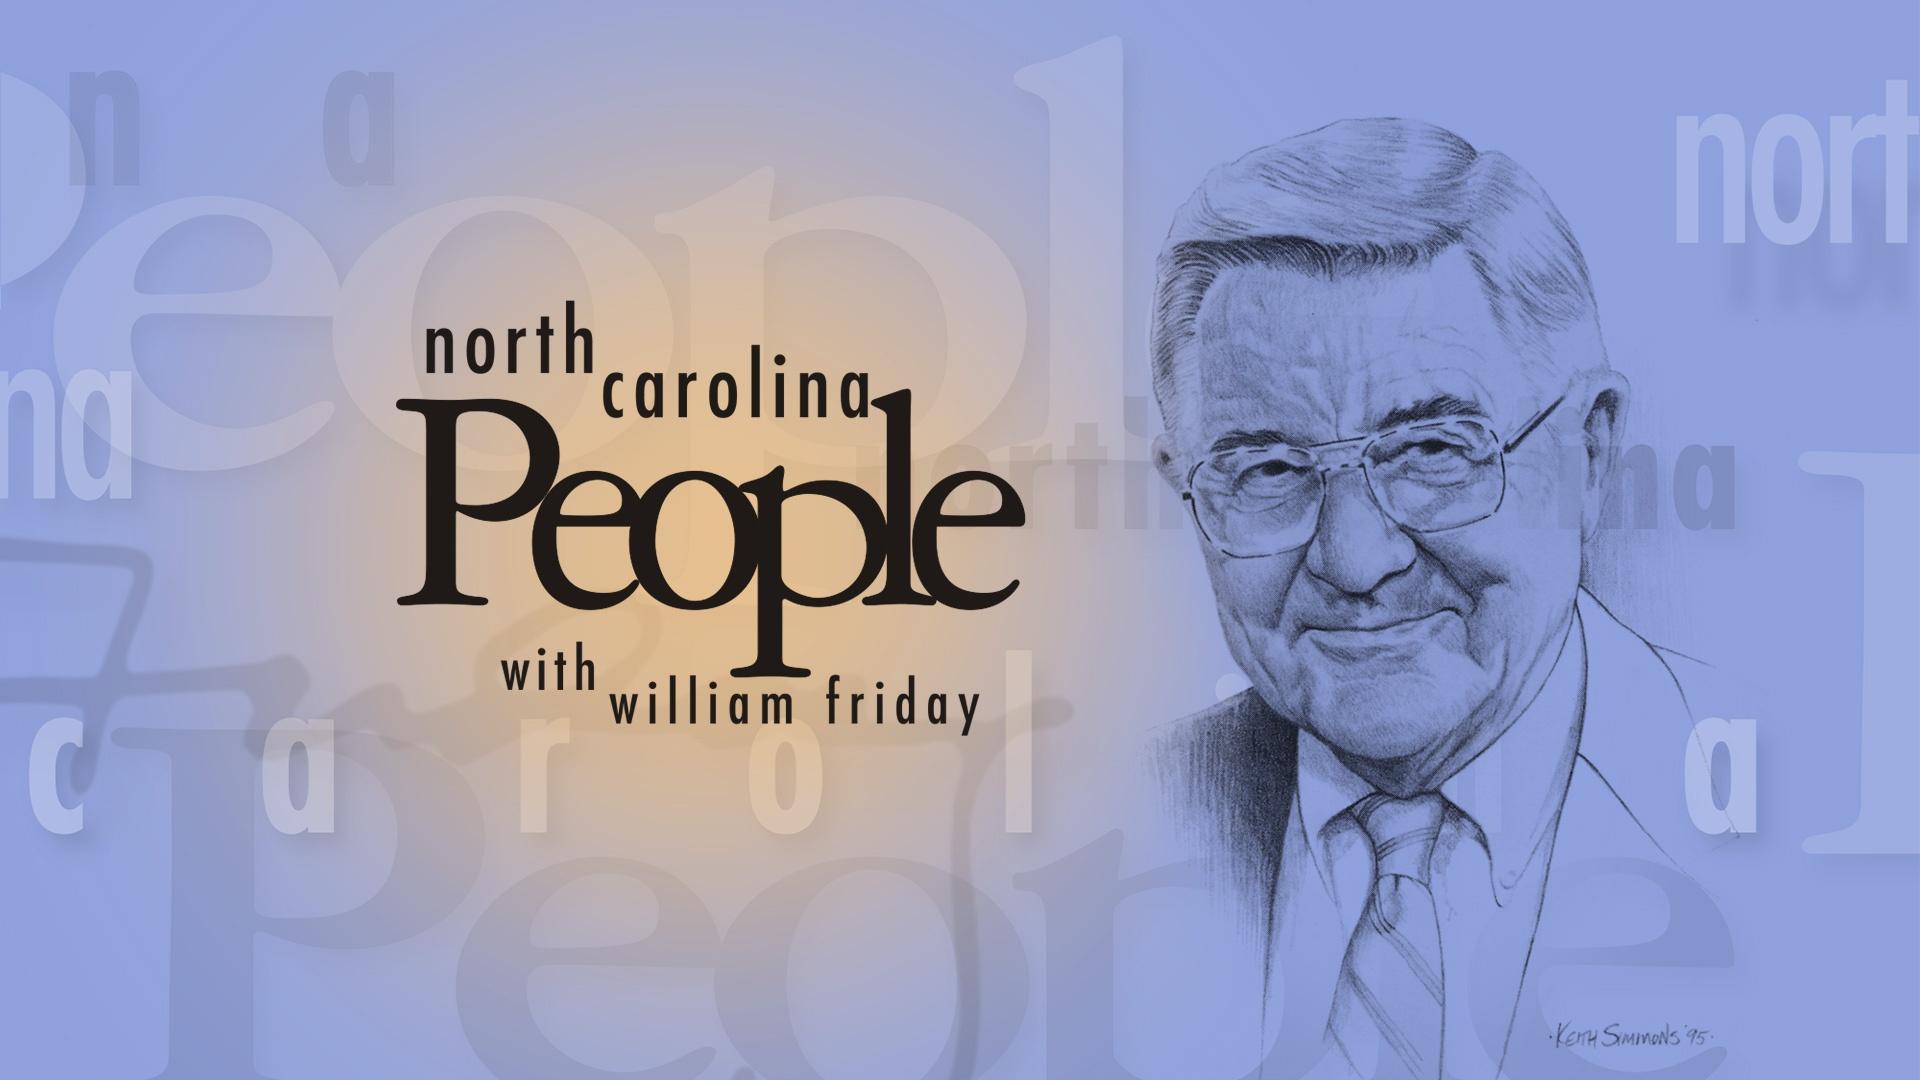 North Carolina People